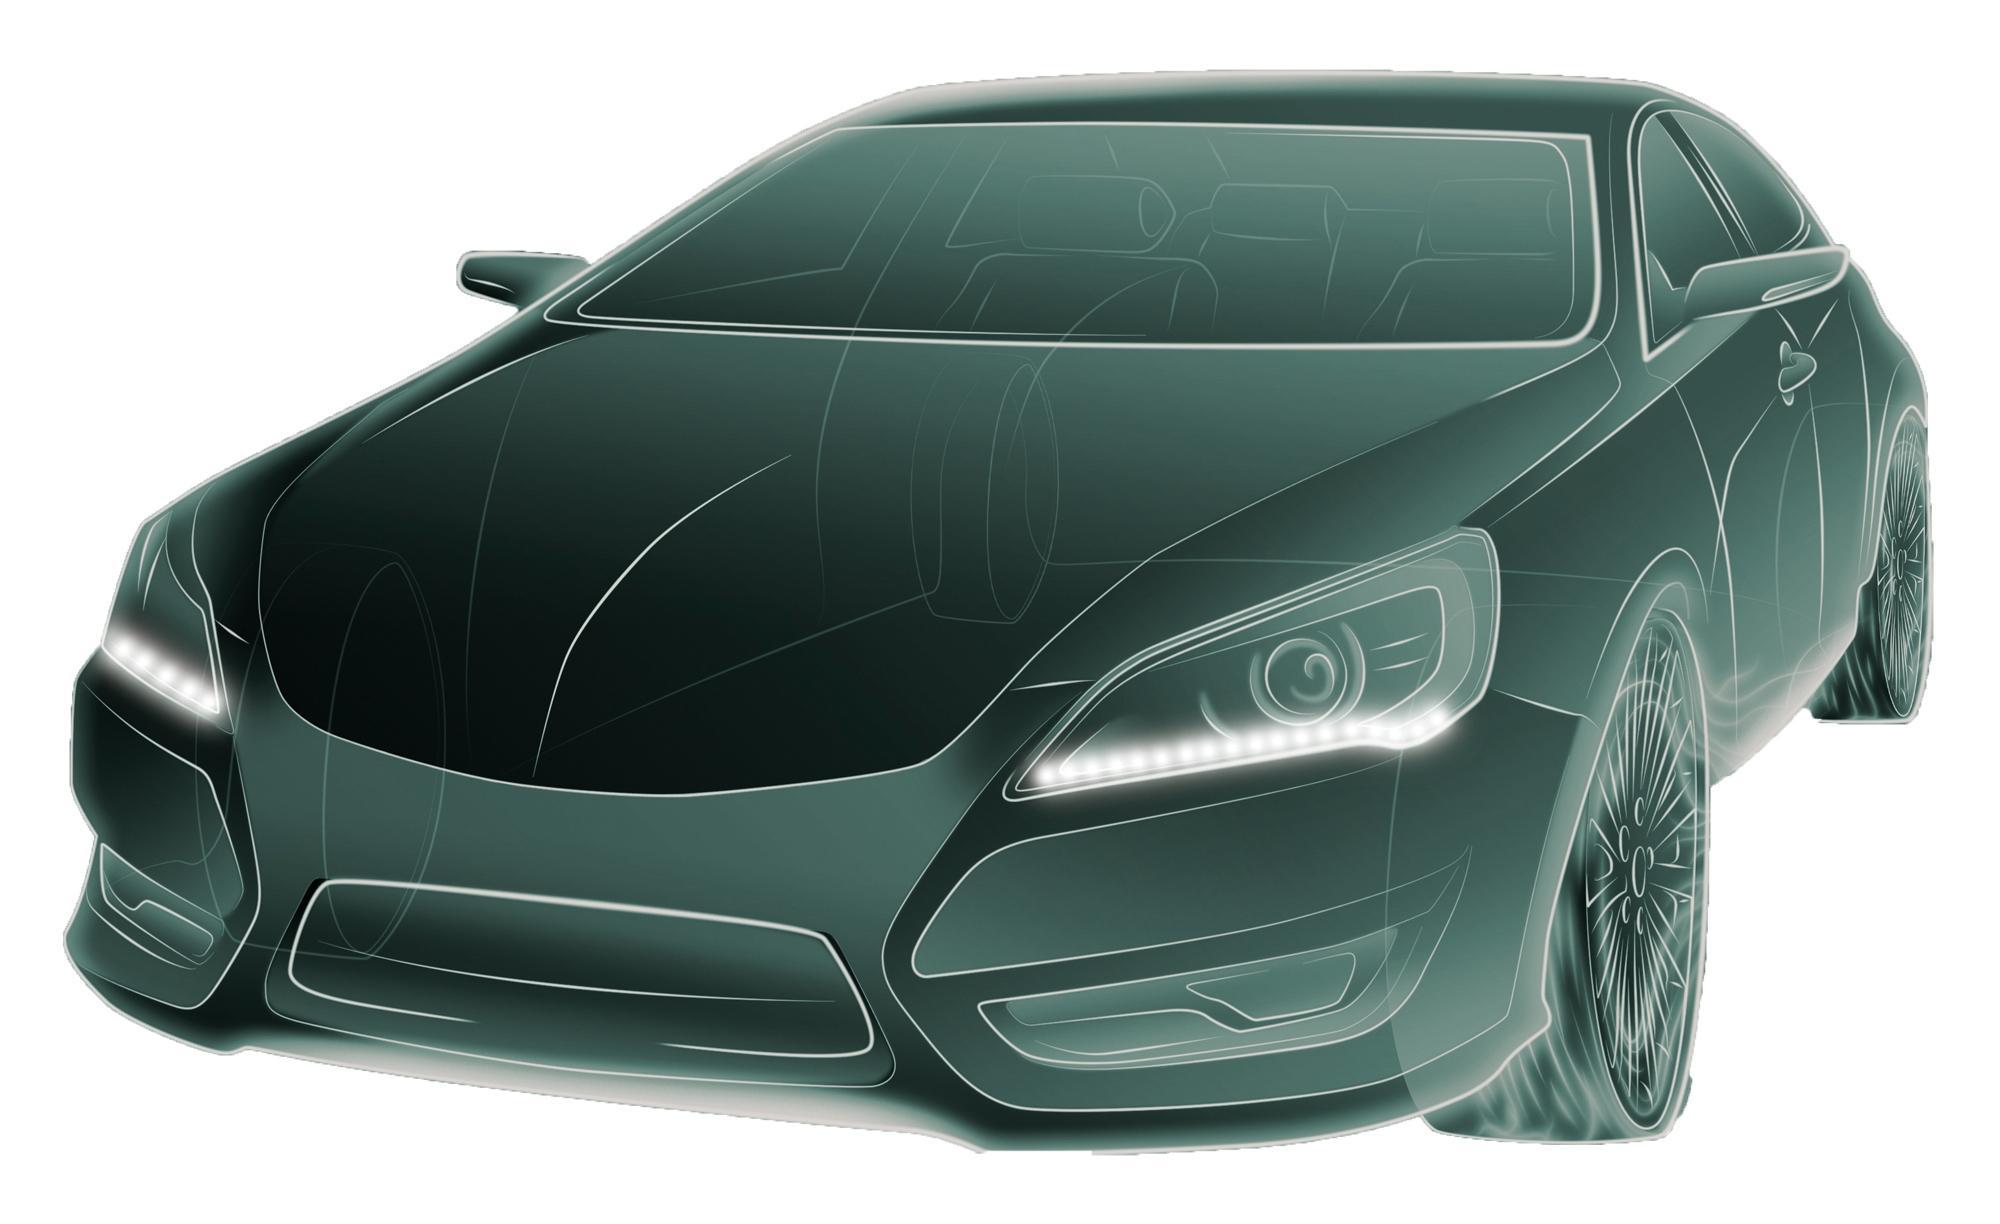 Prism Flexi Car Headlight DRL Daytime Running Styling